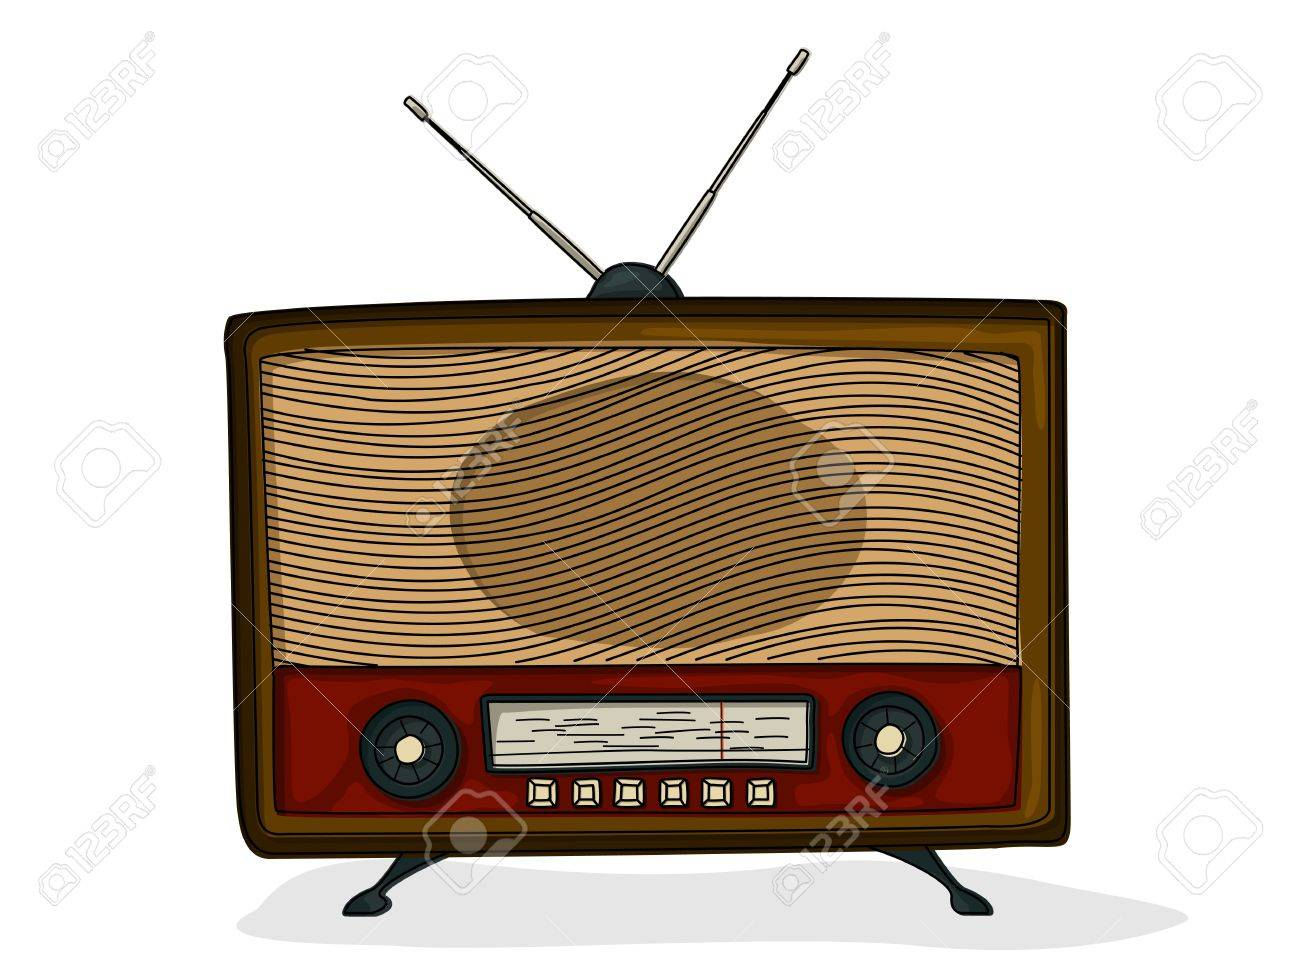 1300x975 Retro Style Cartoon Radio Drawing Over White Background Royalty